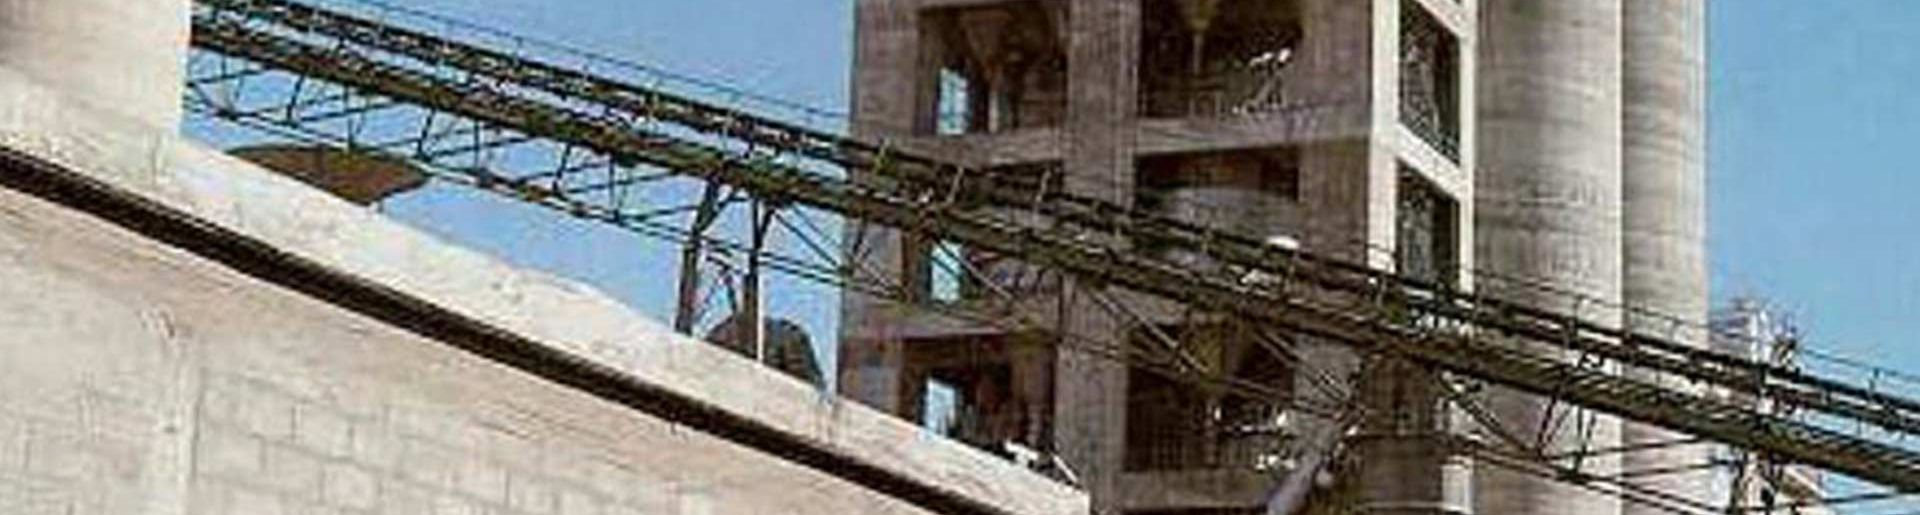 Souq Al Khamıs Çimento Fabrikası